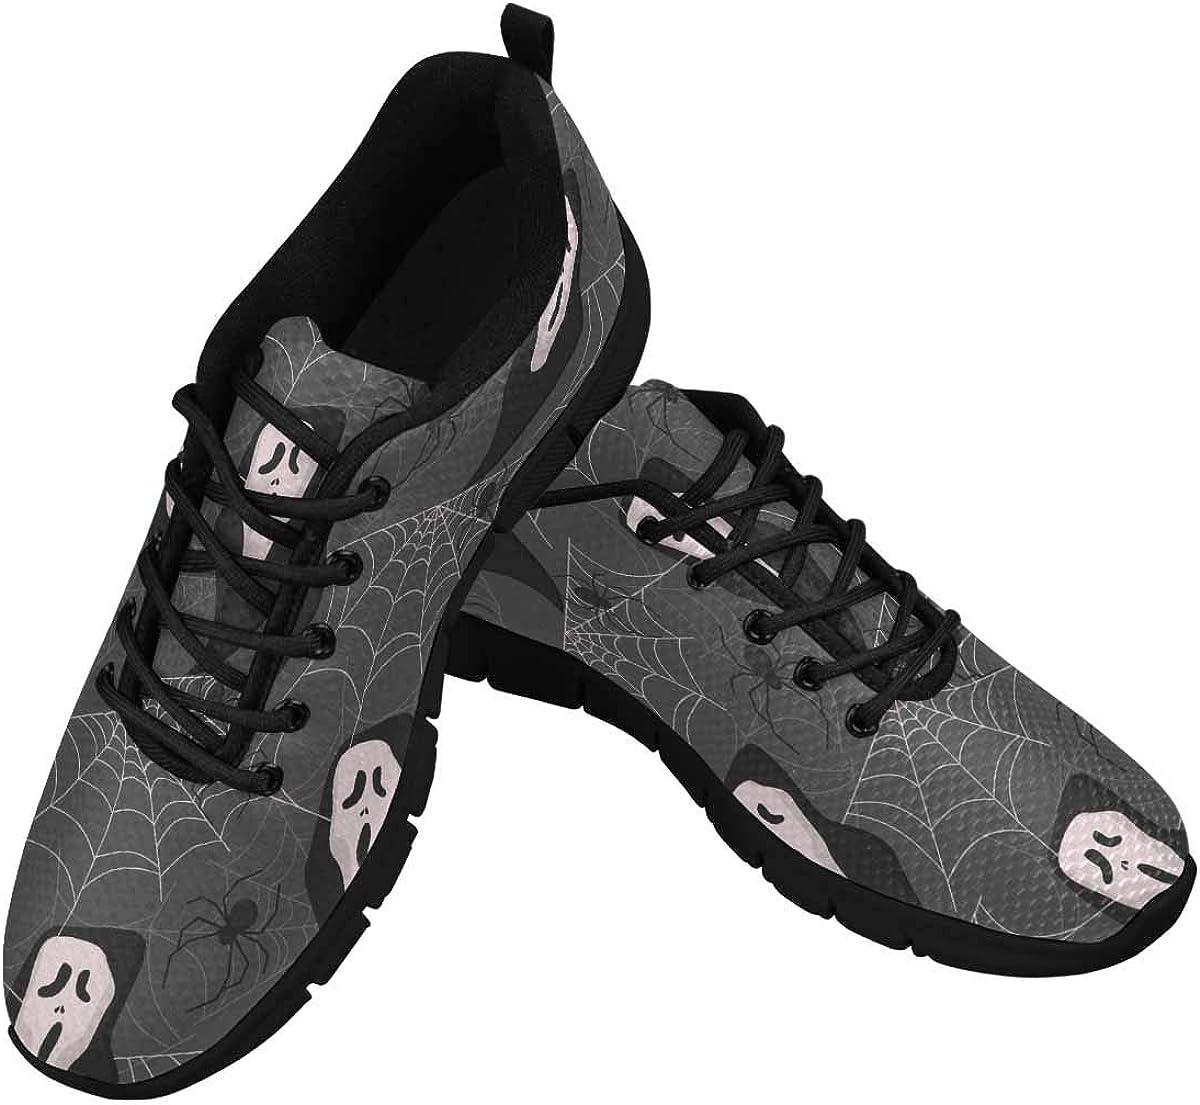 INTERESTPRINT Spooky Autumn Women's Lace Up Breathable Non Slip Sneaker